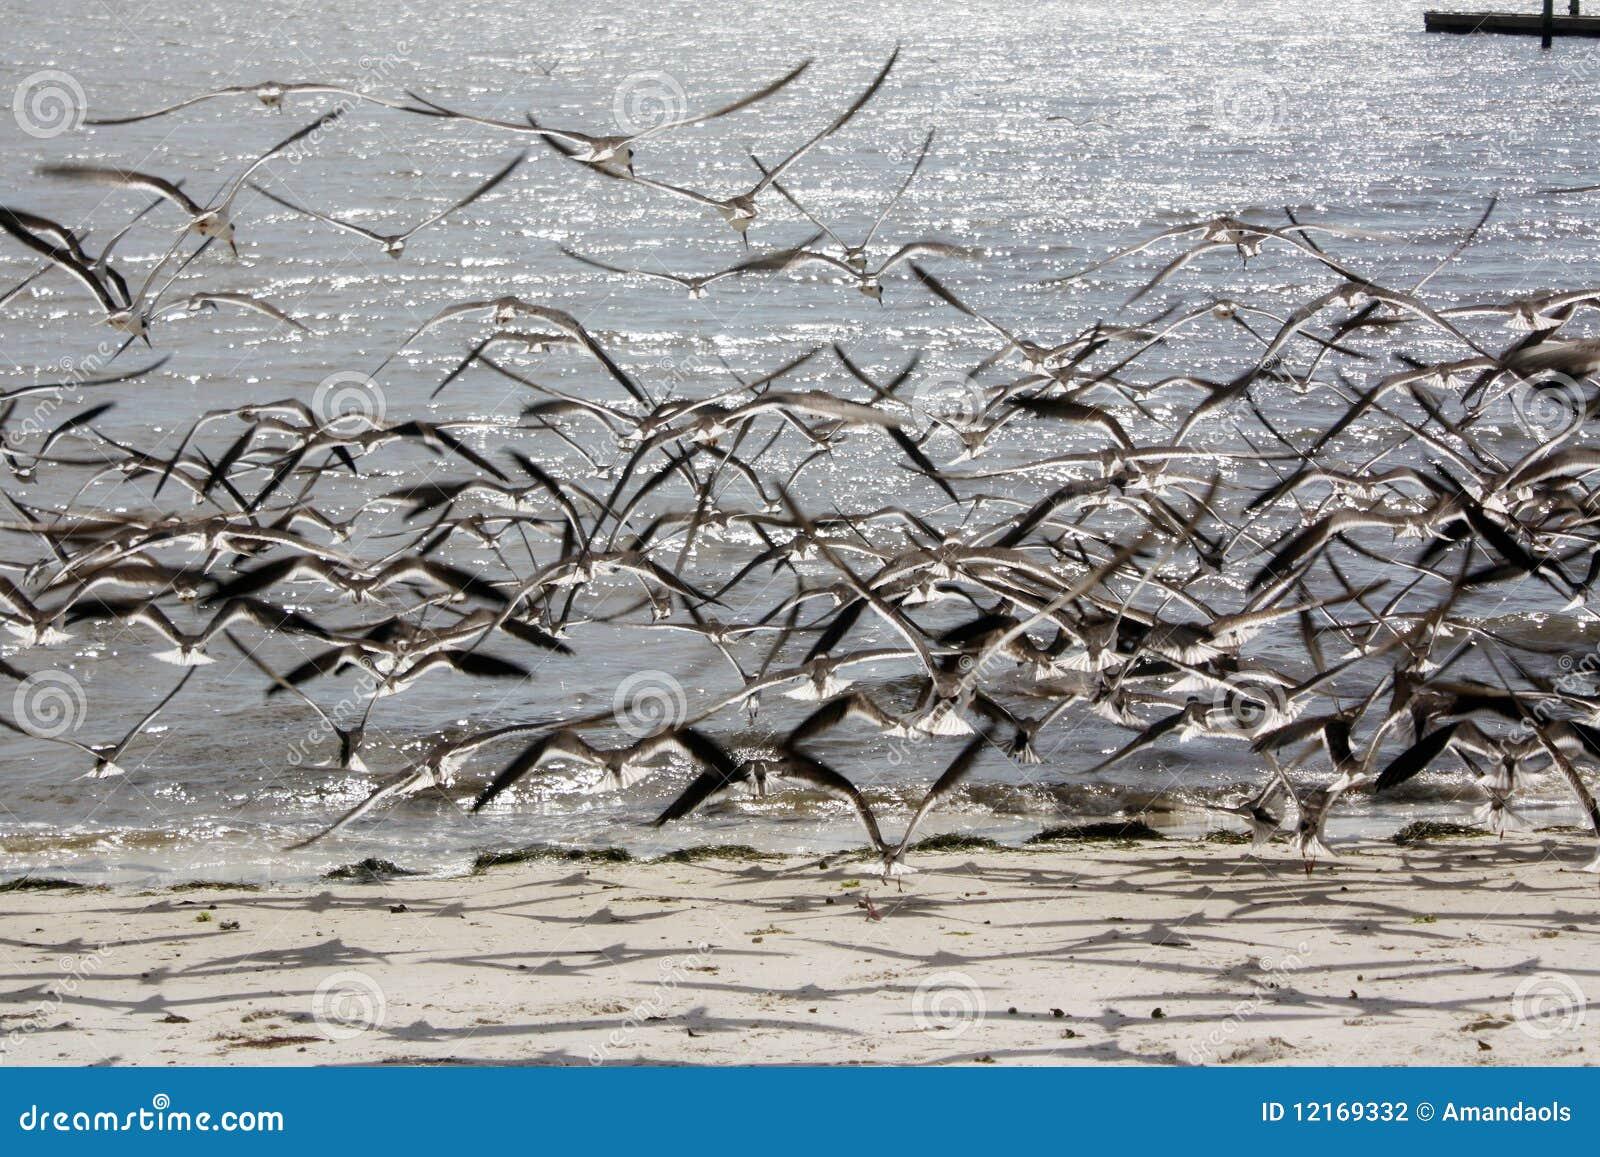 Stock Photography Birds Flying Image12169332